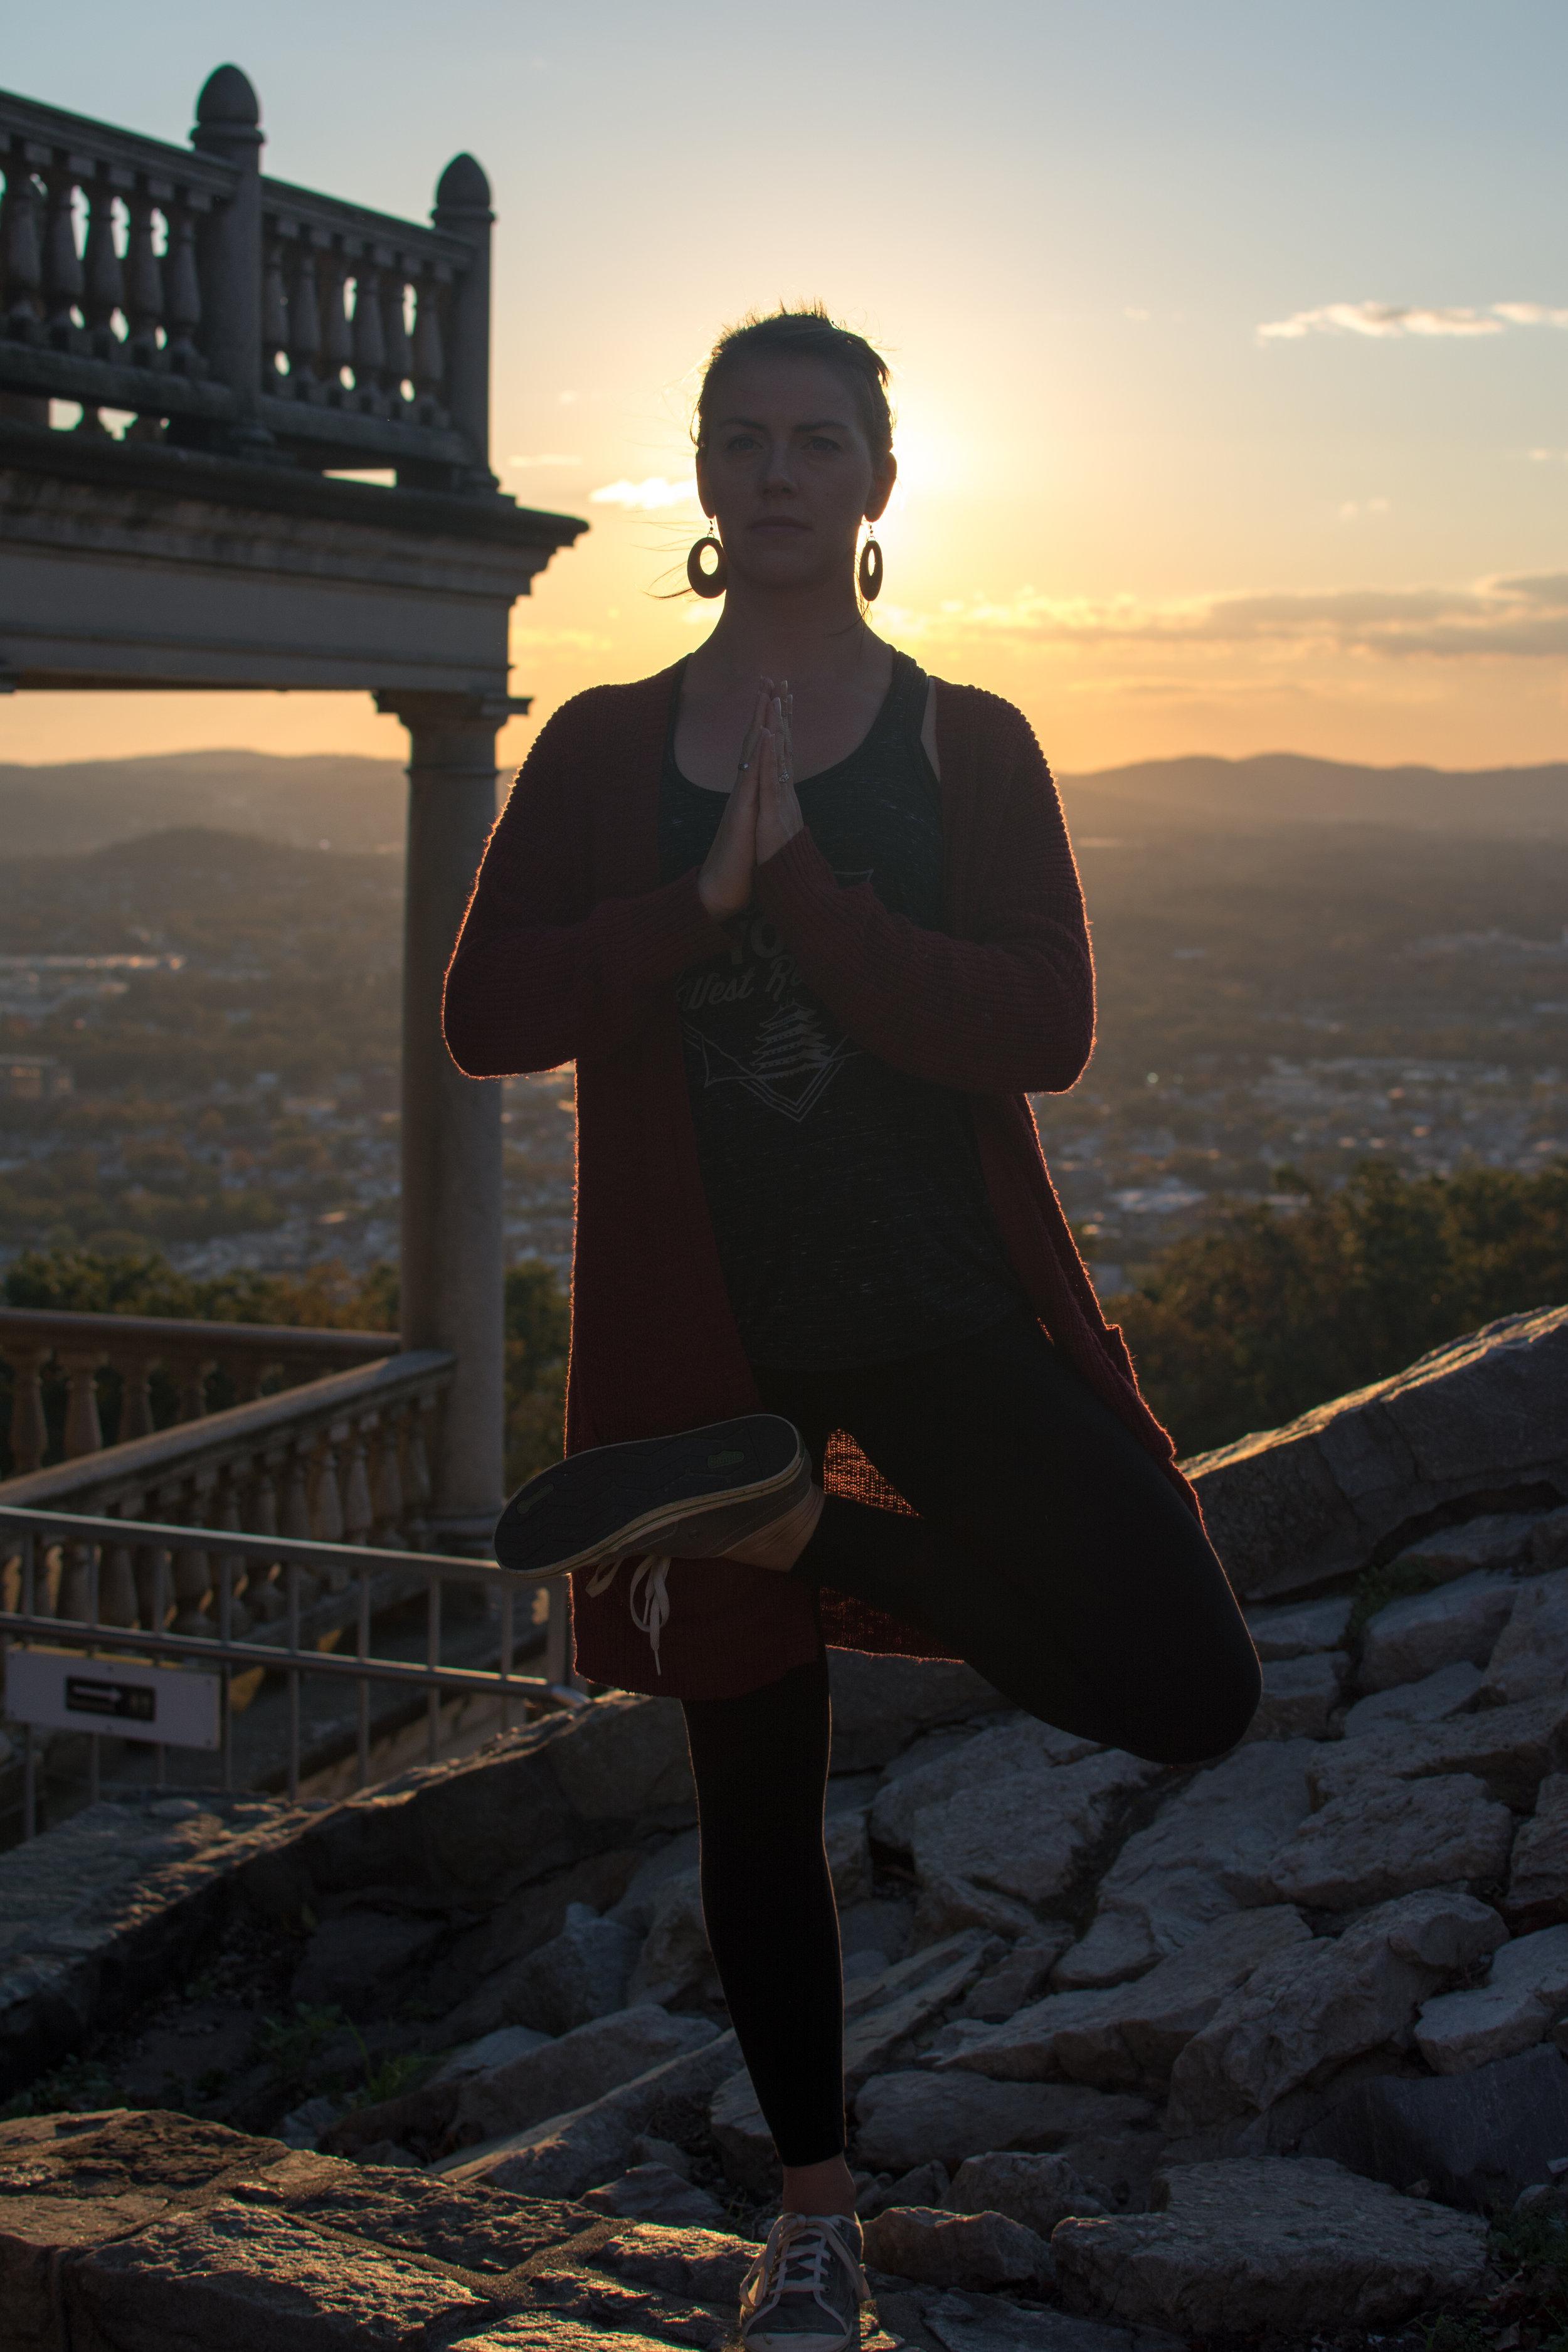 bikram-yoga-west-reading-tree-pose.jpg